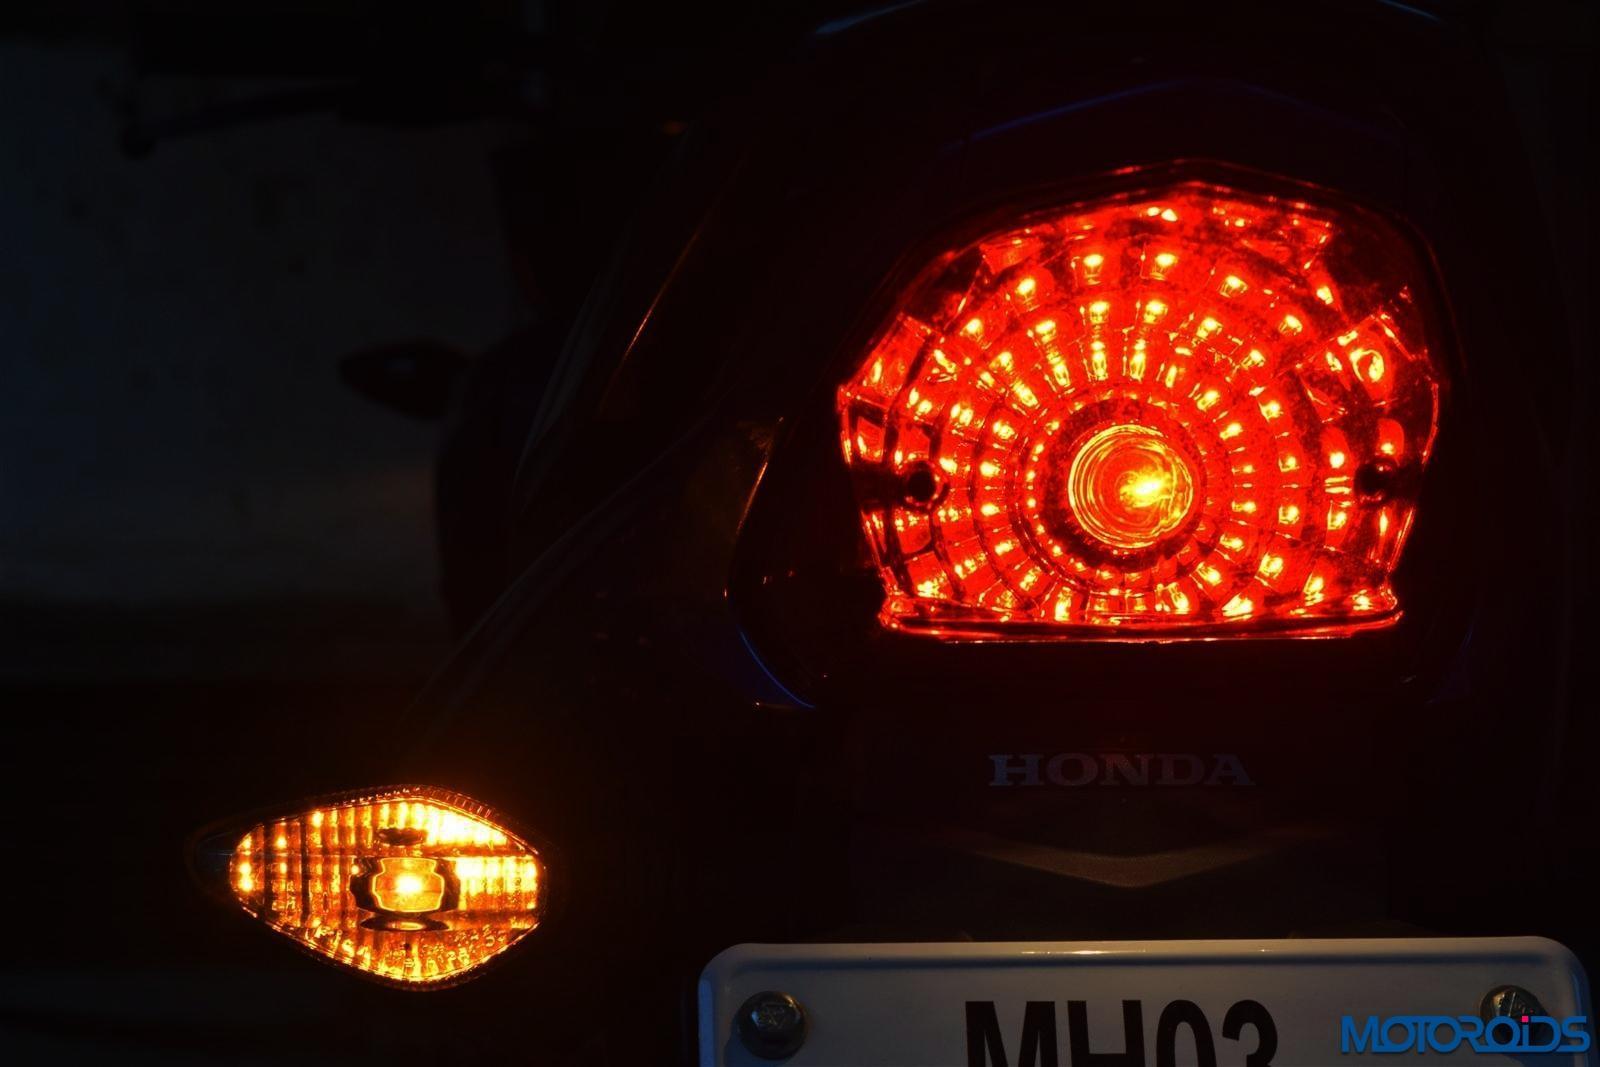 Honda Livo tail lamp (52)